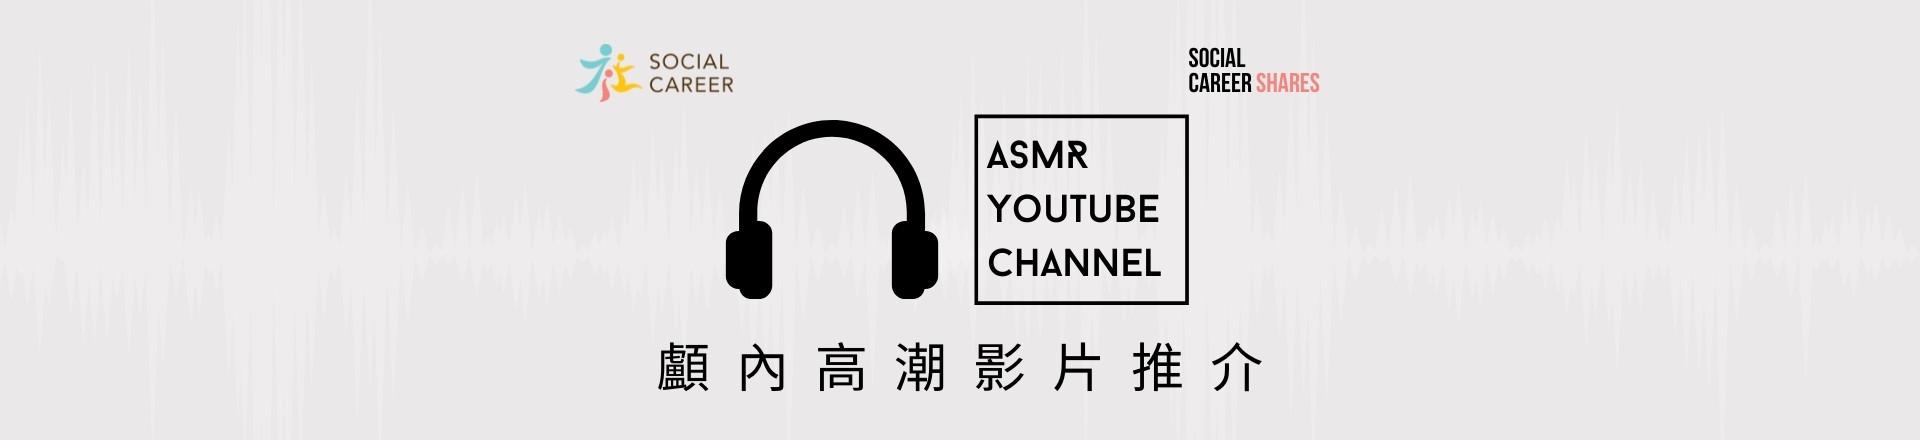 ASMR YOUTUBE VIDEO推介